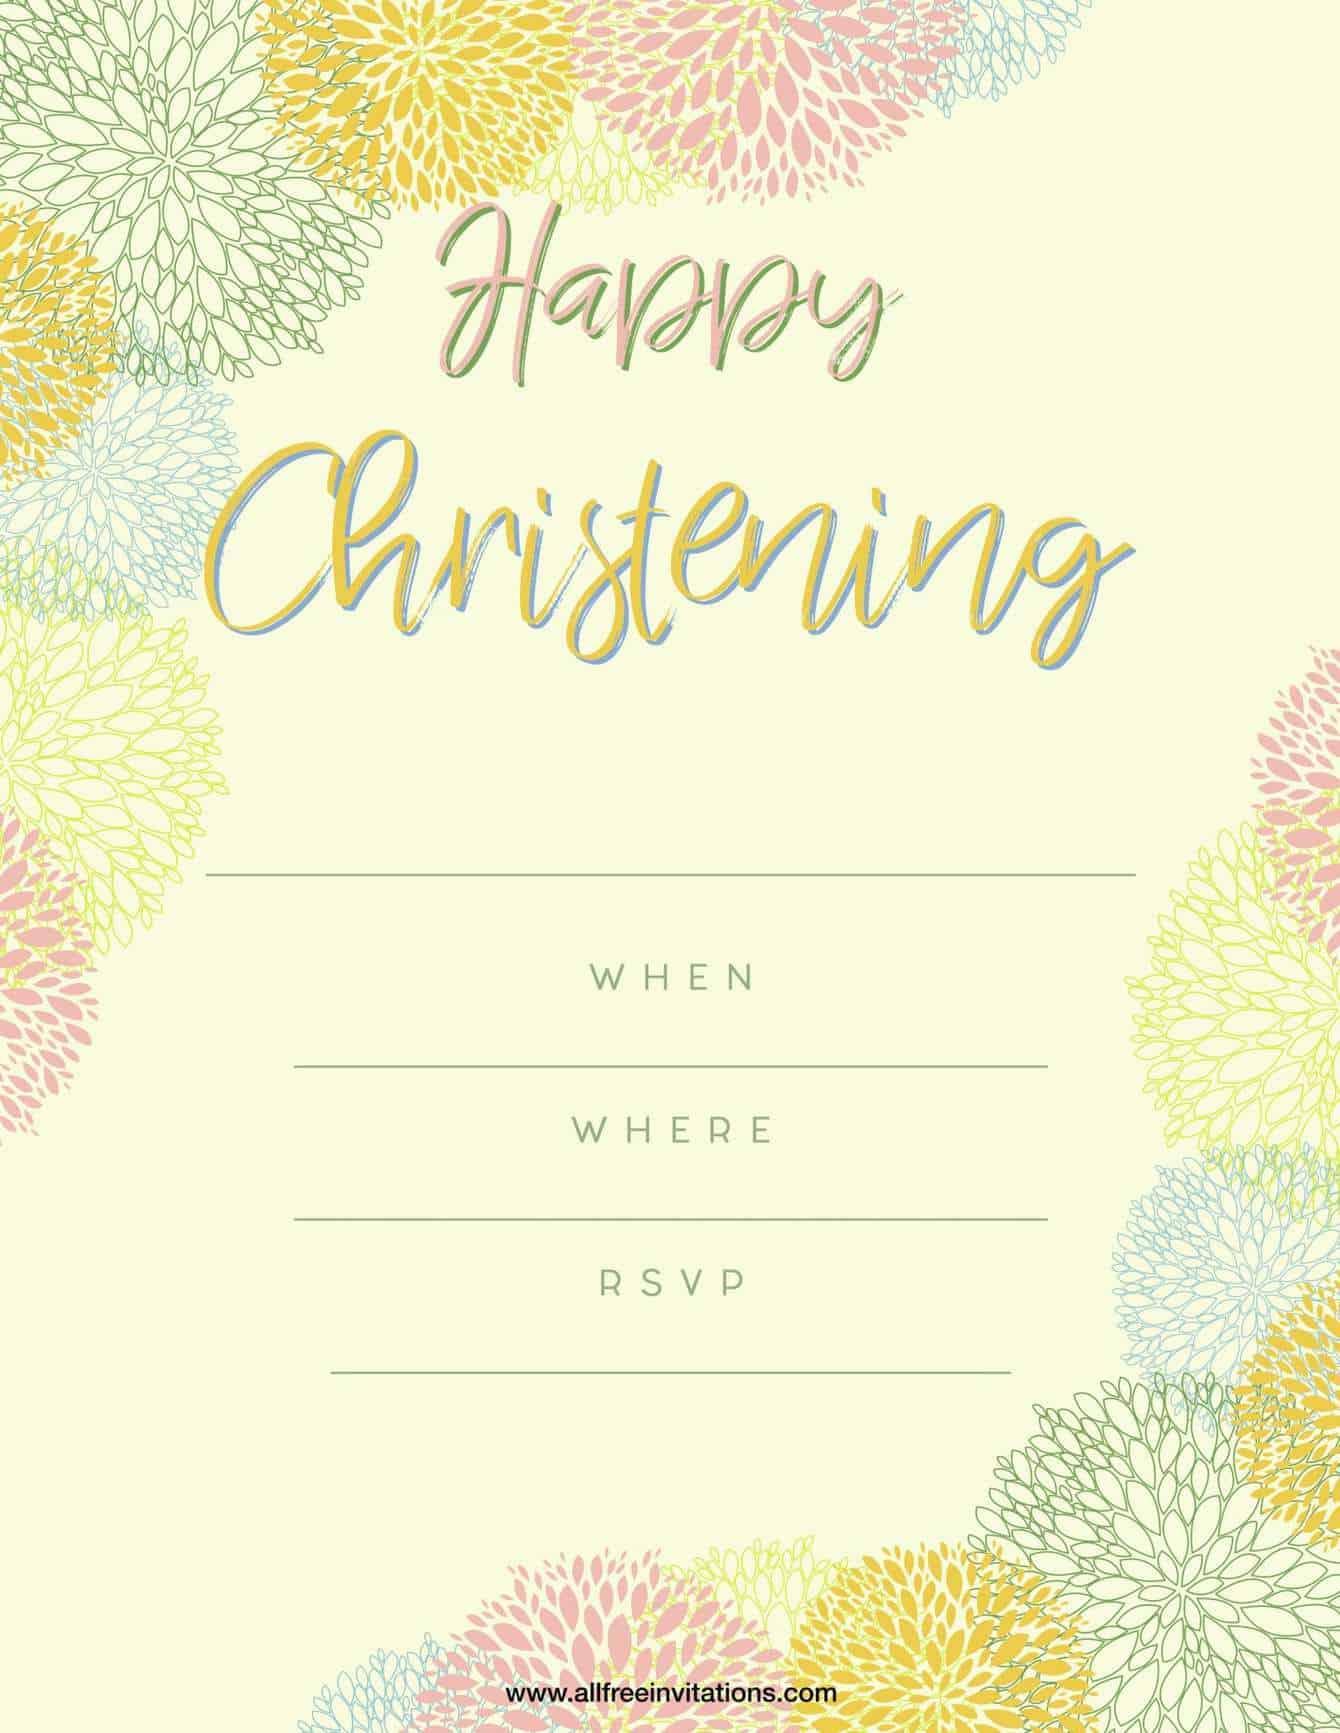 Happy Christening Party Invitation Light  Yellow Design